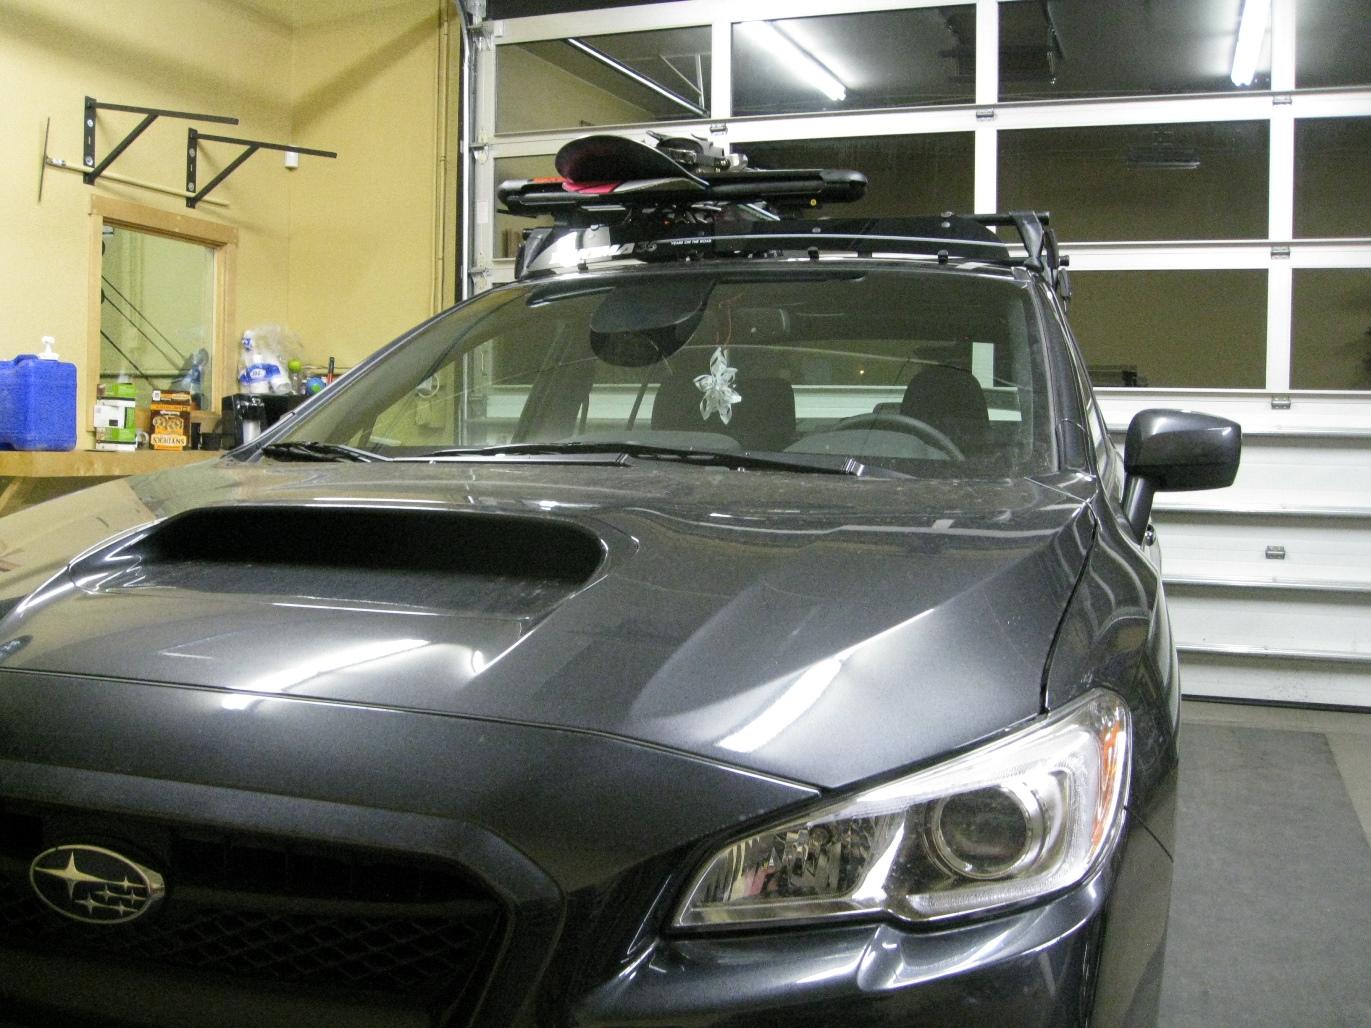 2018 Subaru Wrx Sedan Base Rack Fairing And Ski Snowboard Yakima